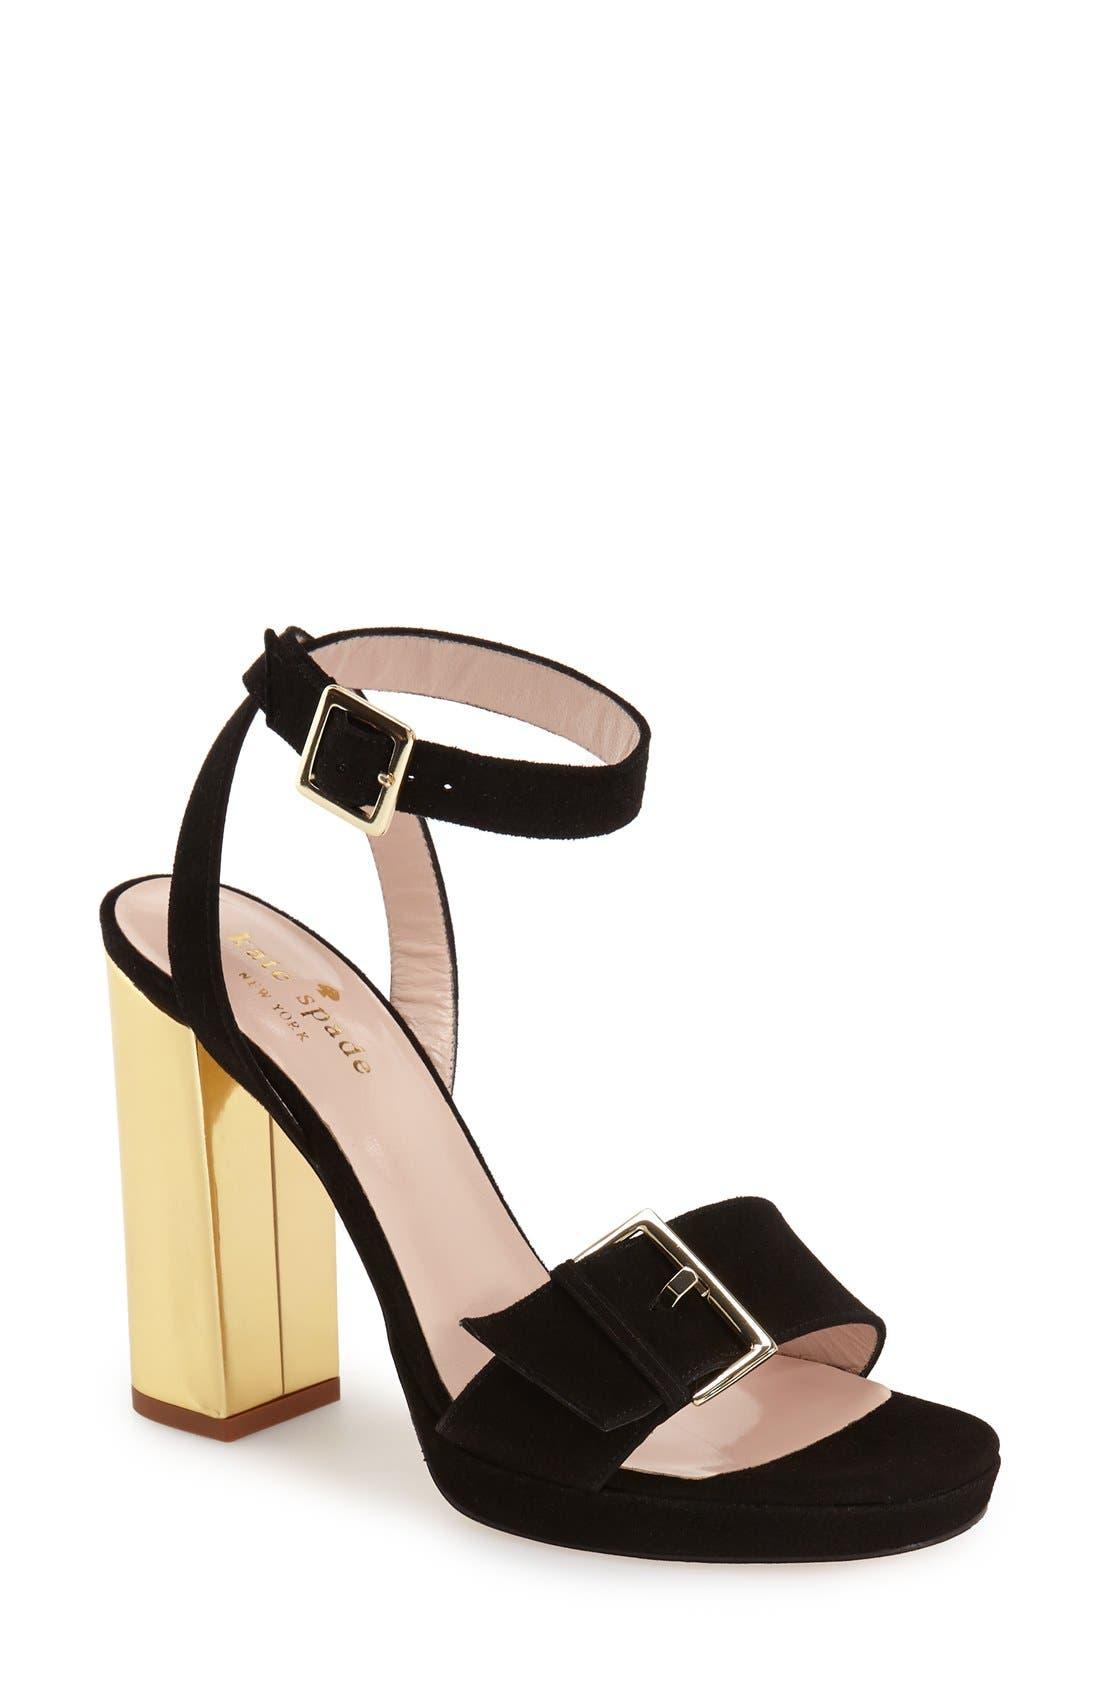 Main Image - kate spade new york 'breeze' sandal (Women)